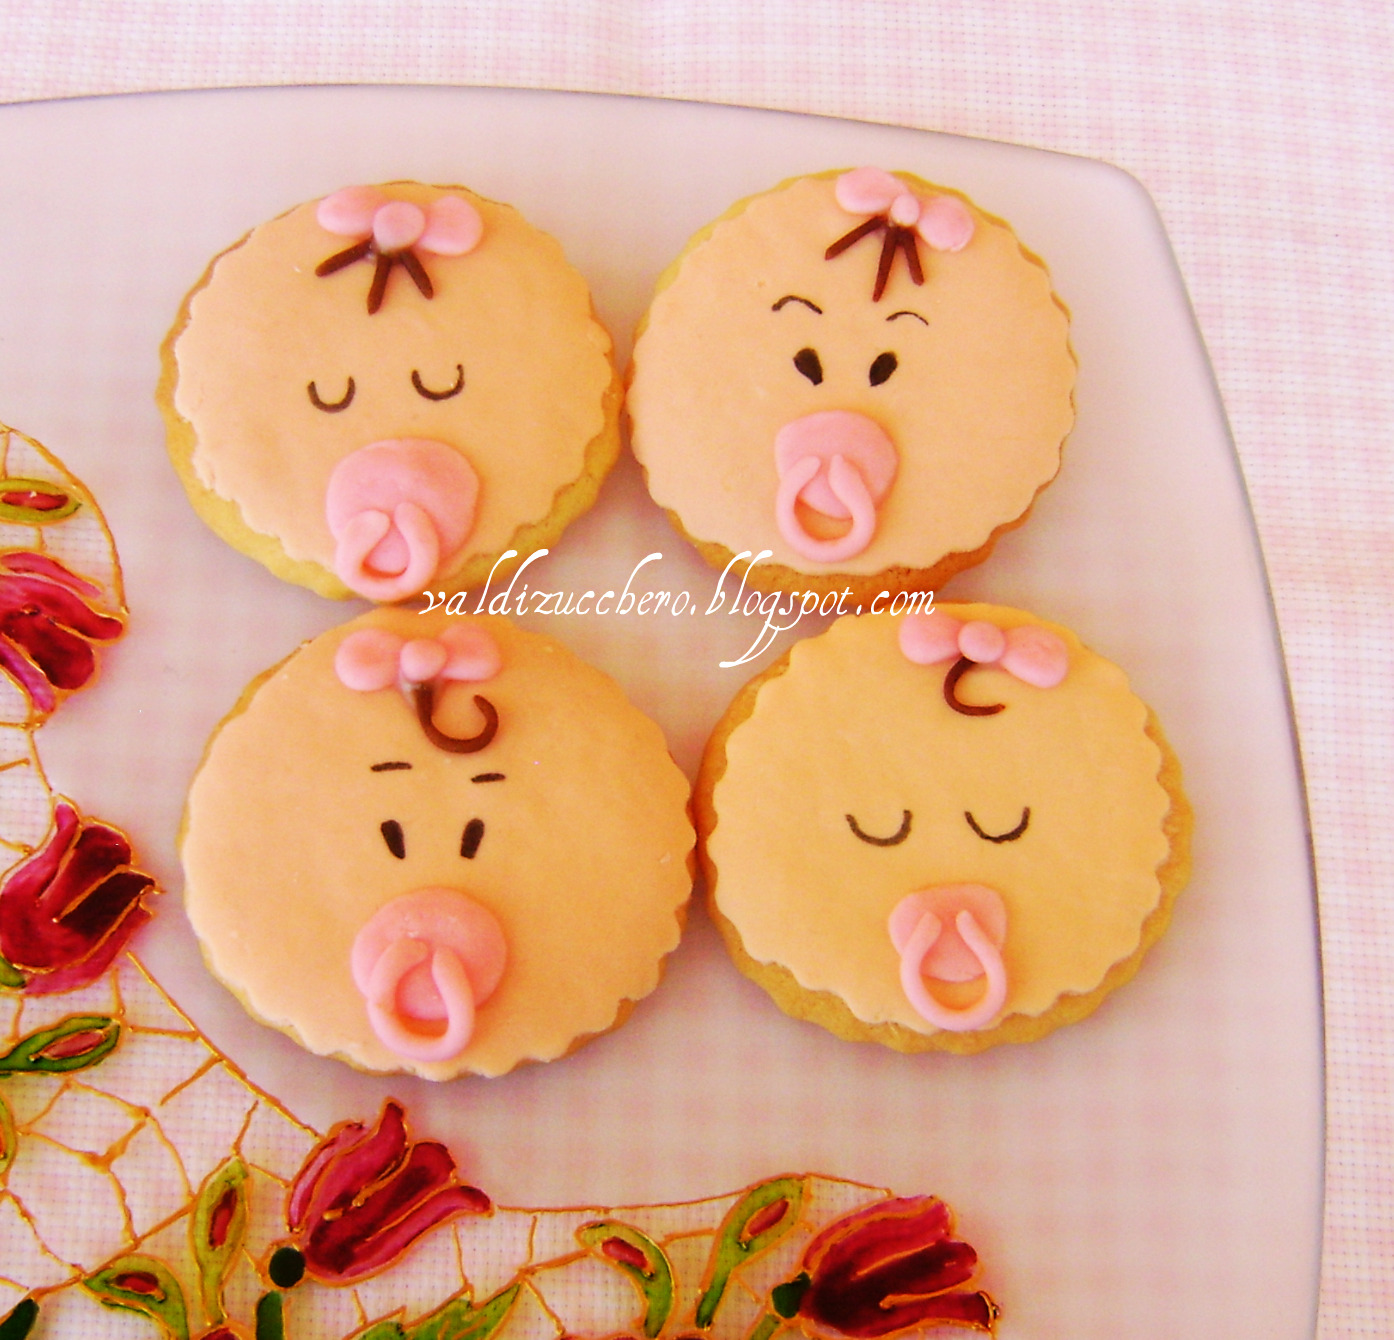 Ben noto Val di zucchero: Biscotti decorati per la nascita di una bimba GO51